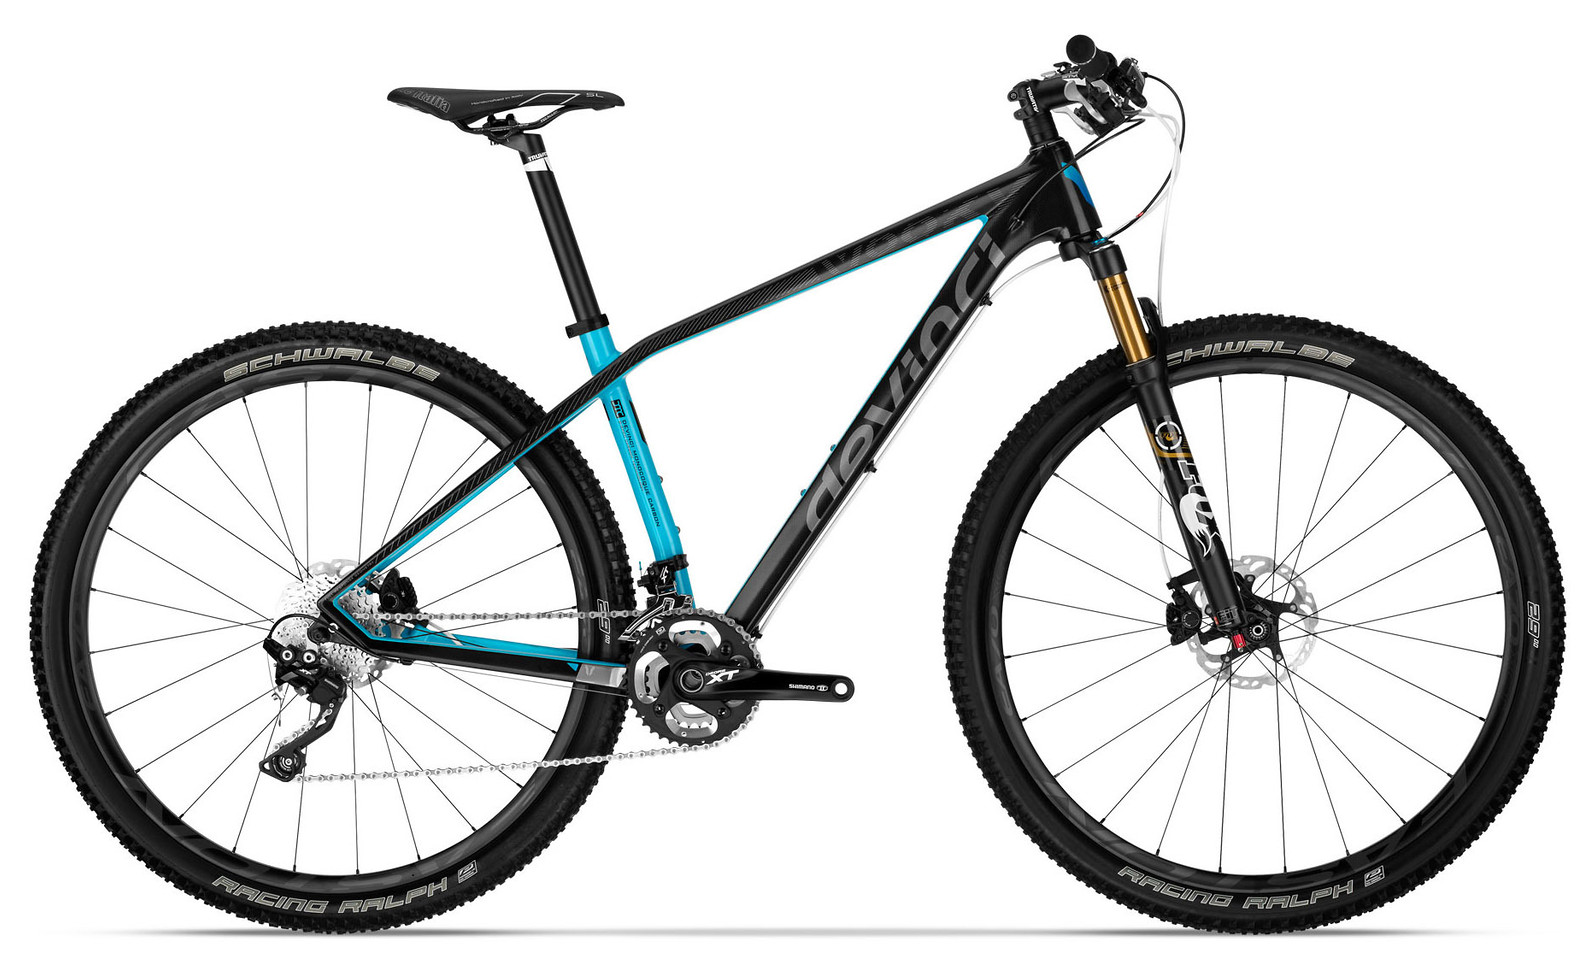 Bike - 2014 Devinci Wooky Carbon SL